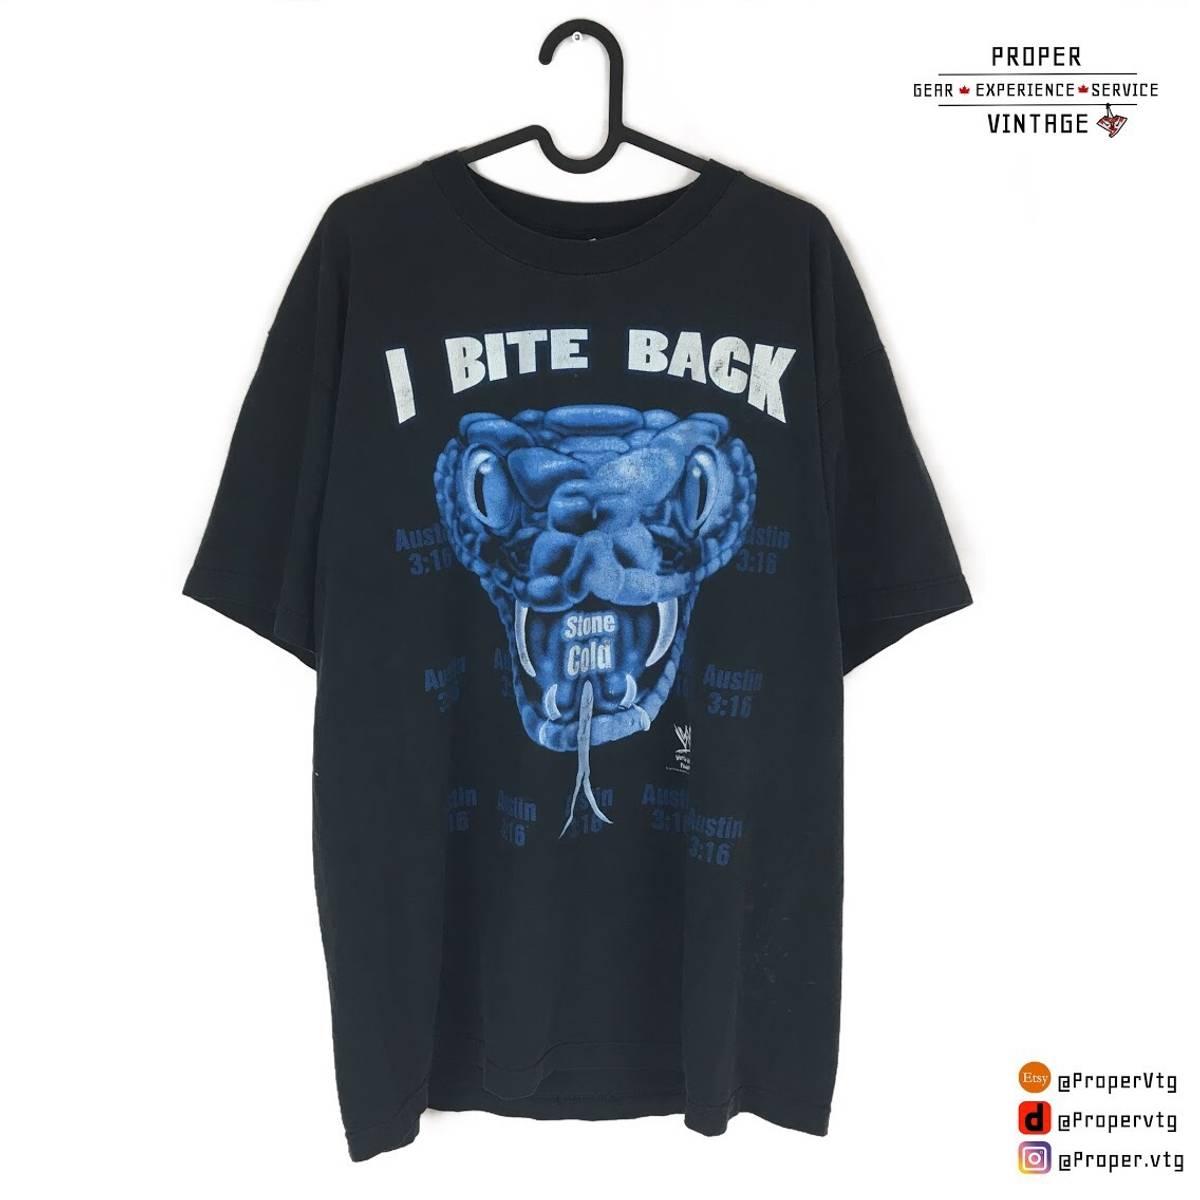 5dc345da Wwe ×. Vintage Stone Cold Steve Austin I Bite Back Snake Short Sleeve T  Shirt Tee 80s ...